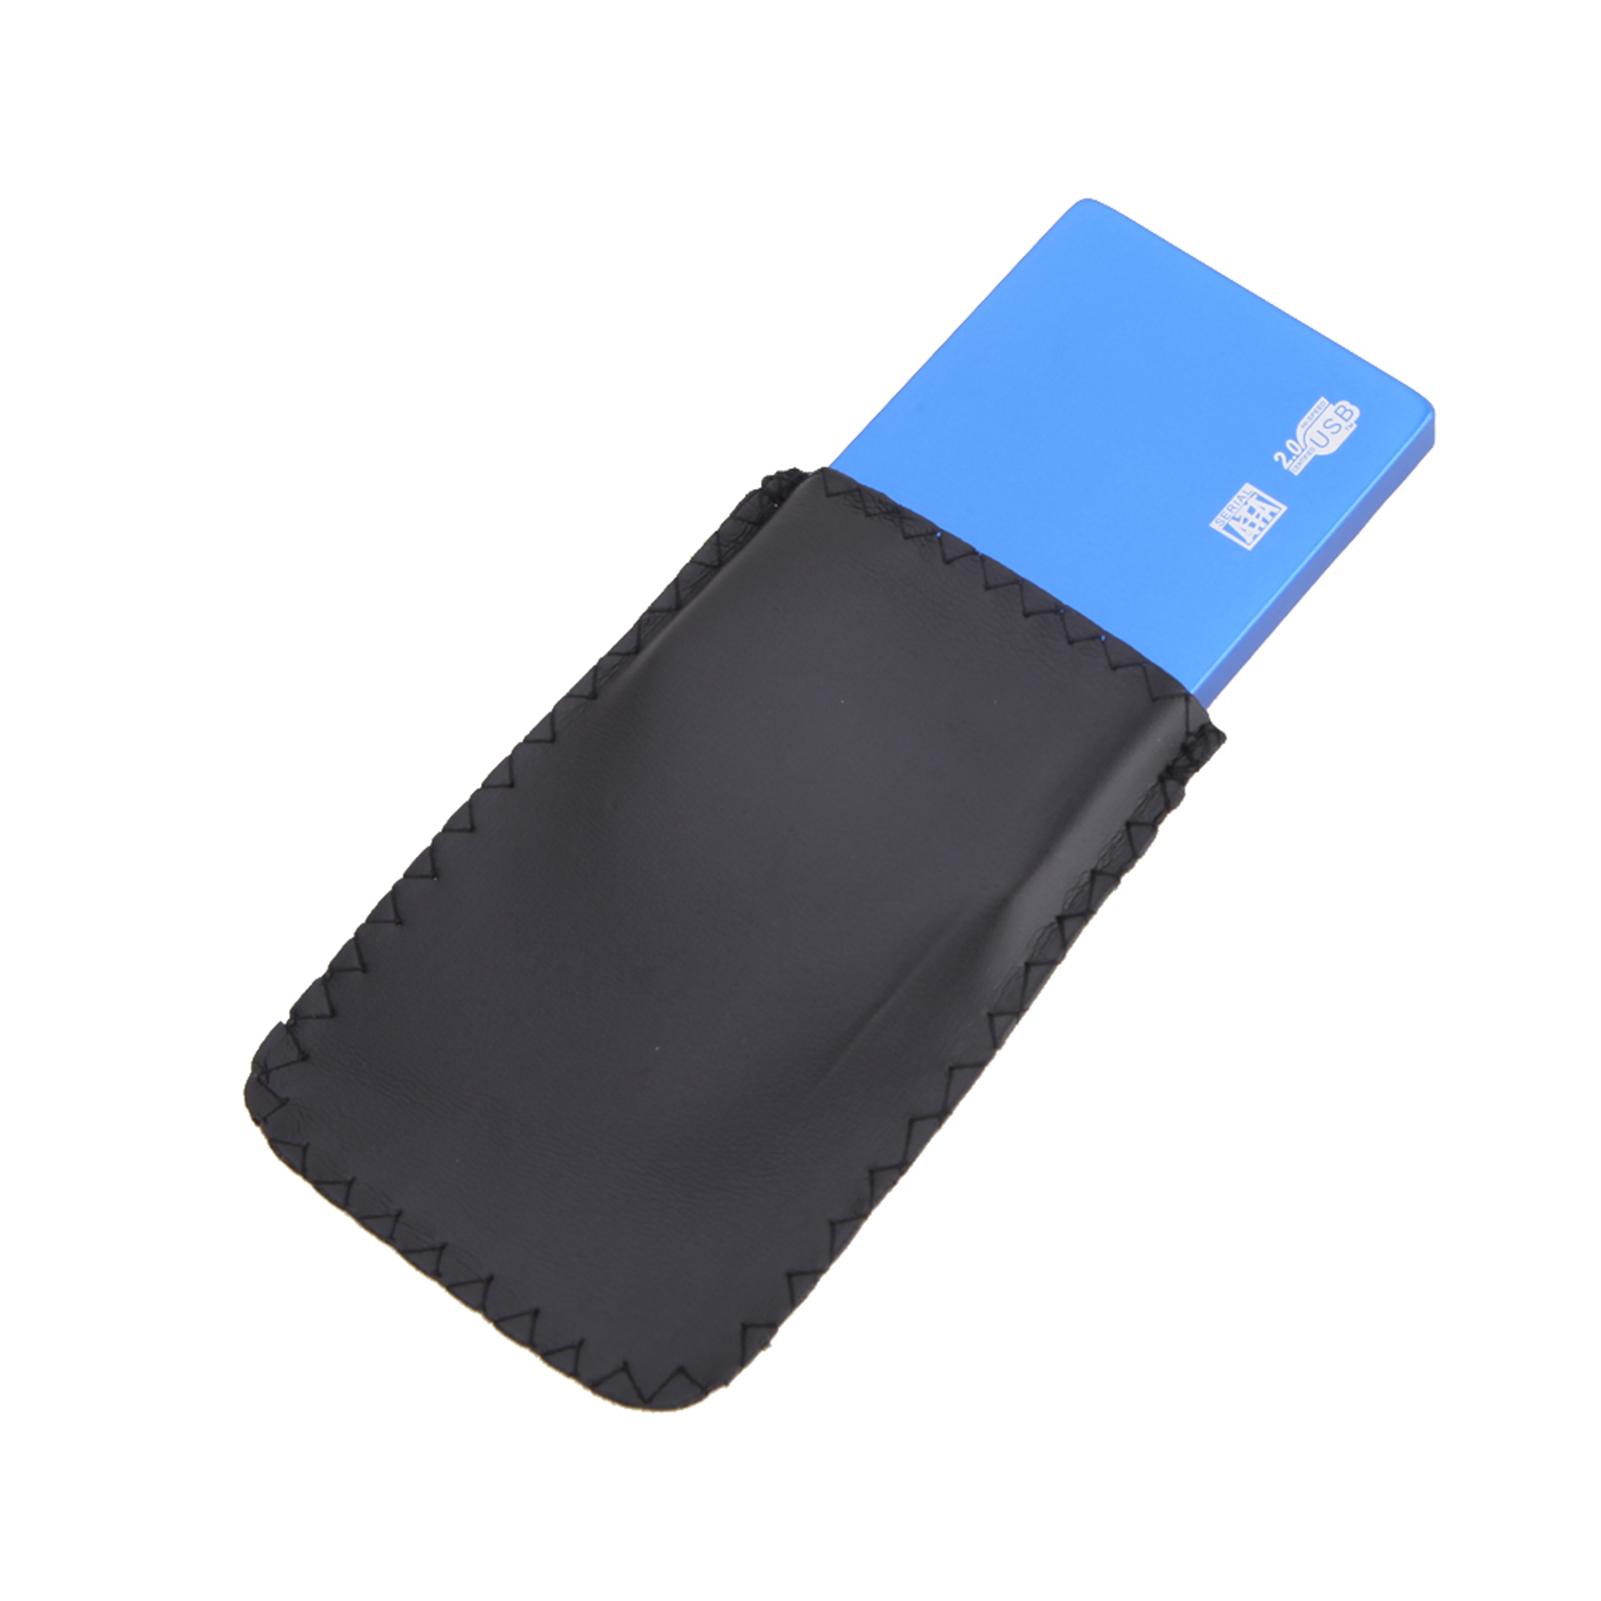 Ultra-Slim USB 2.0 Hard Drive External Enclosure Case for 2.5 Inch SATA HDD SSD